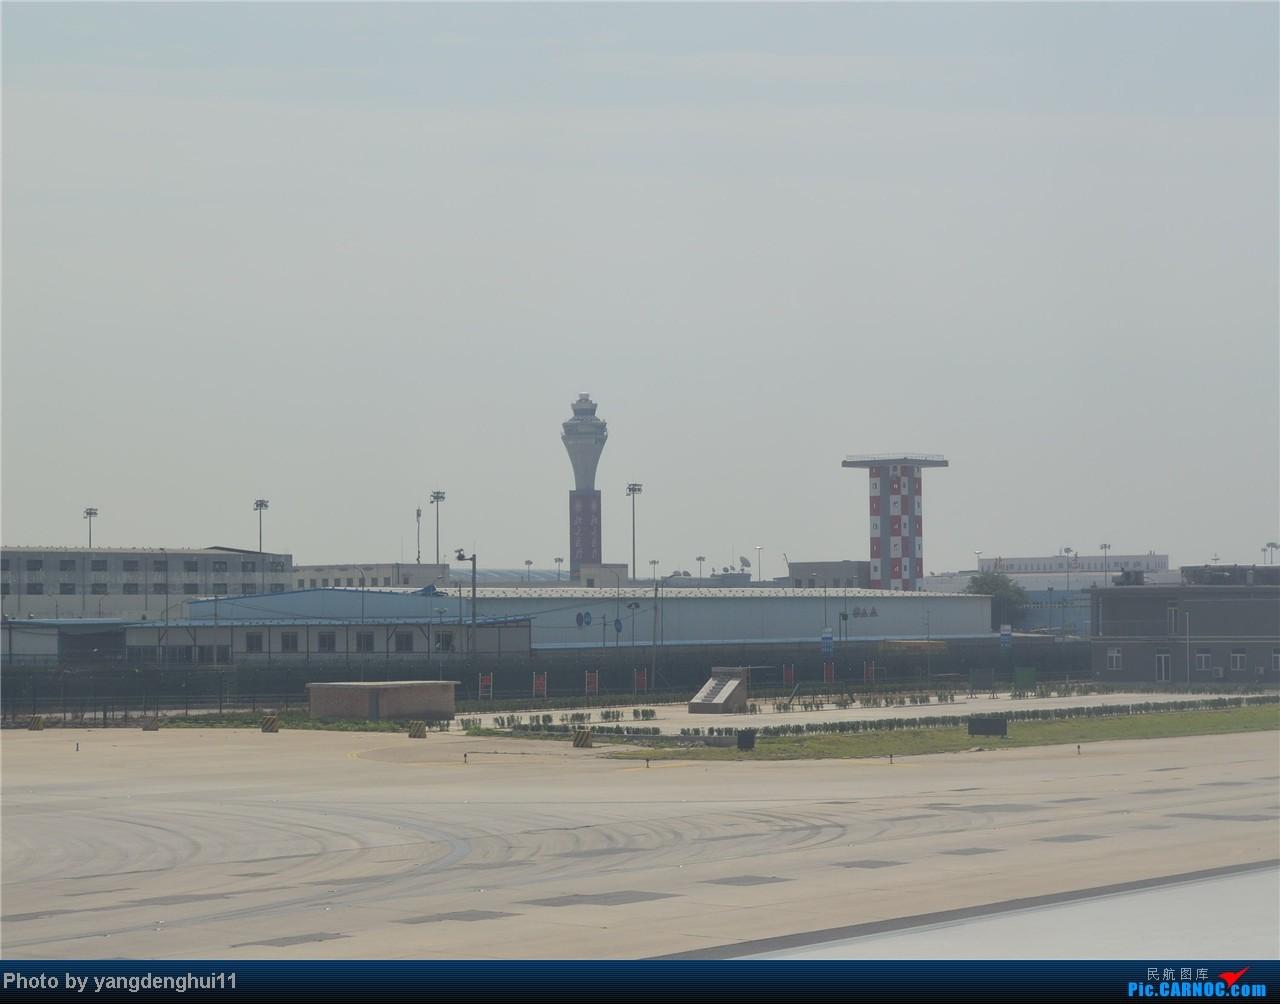 Re:[原创]暑假出游:CTU---PEK---CTU,北京巧遇国航红、蓝凤凰。(上) AIRBUS A340-300 B-2387 中国成都双流机场 中国北京首都机场